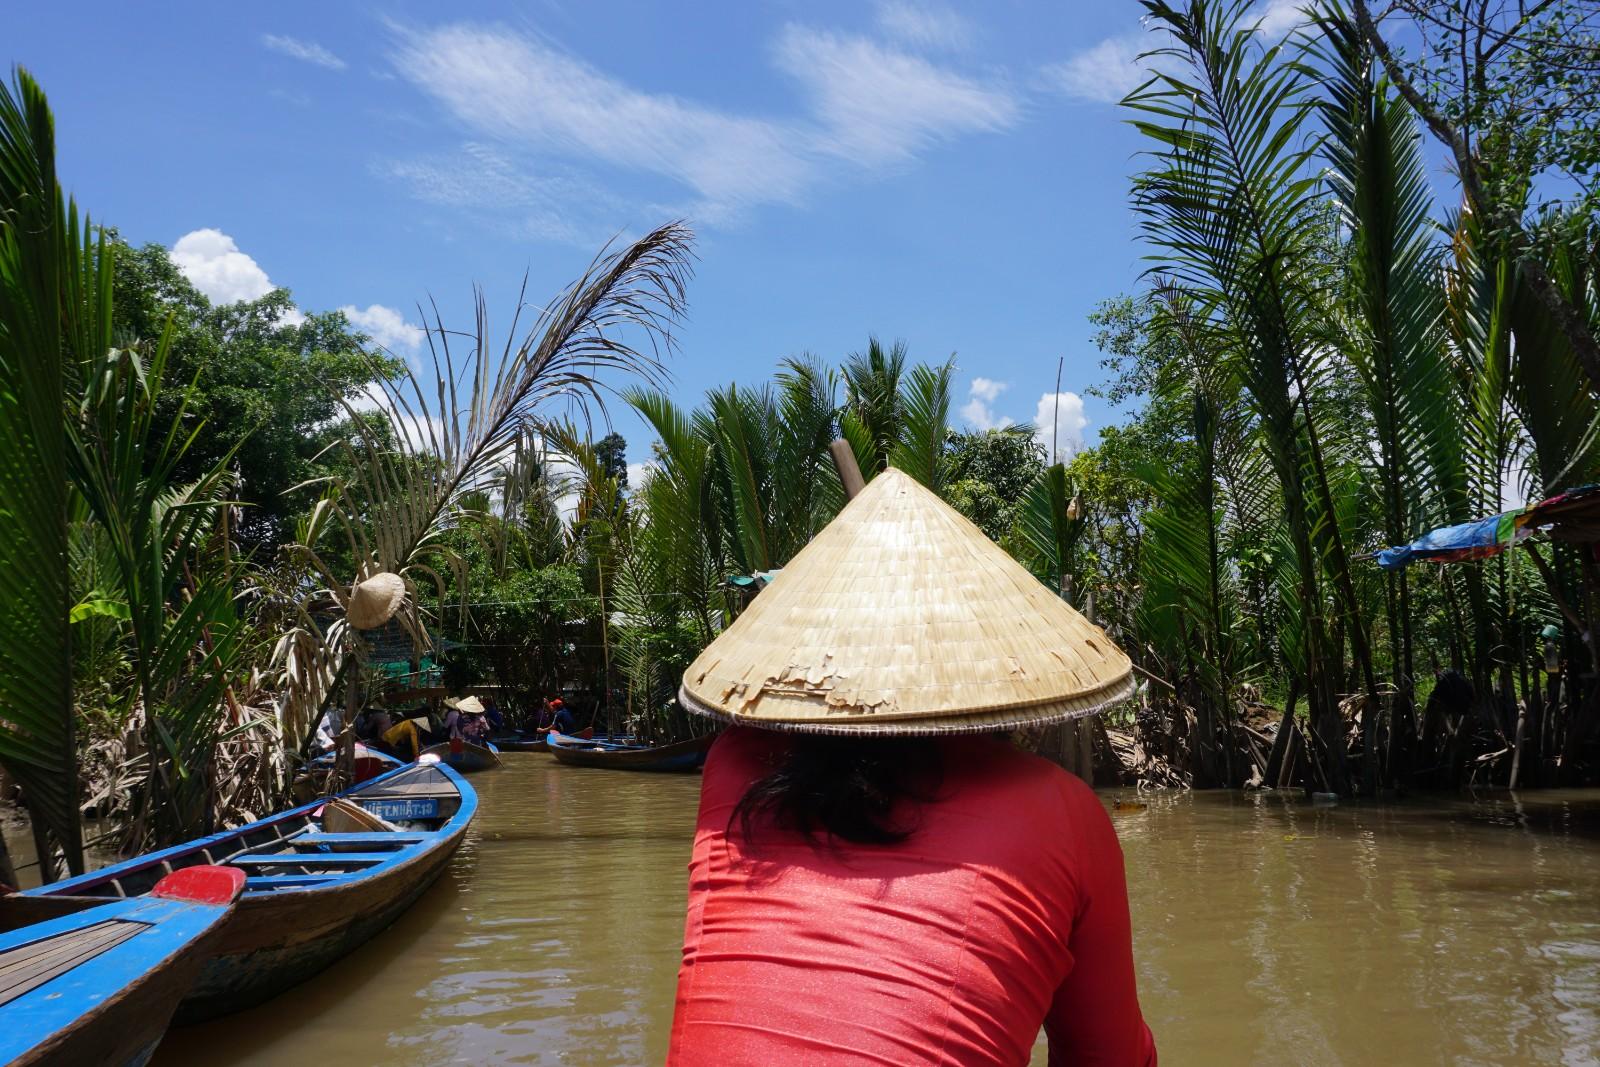 Traditional scene of the Mekong River in Vietnam. boldlygotravel.com